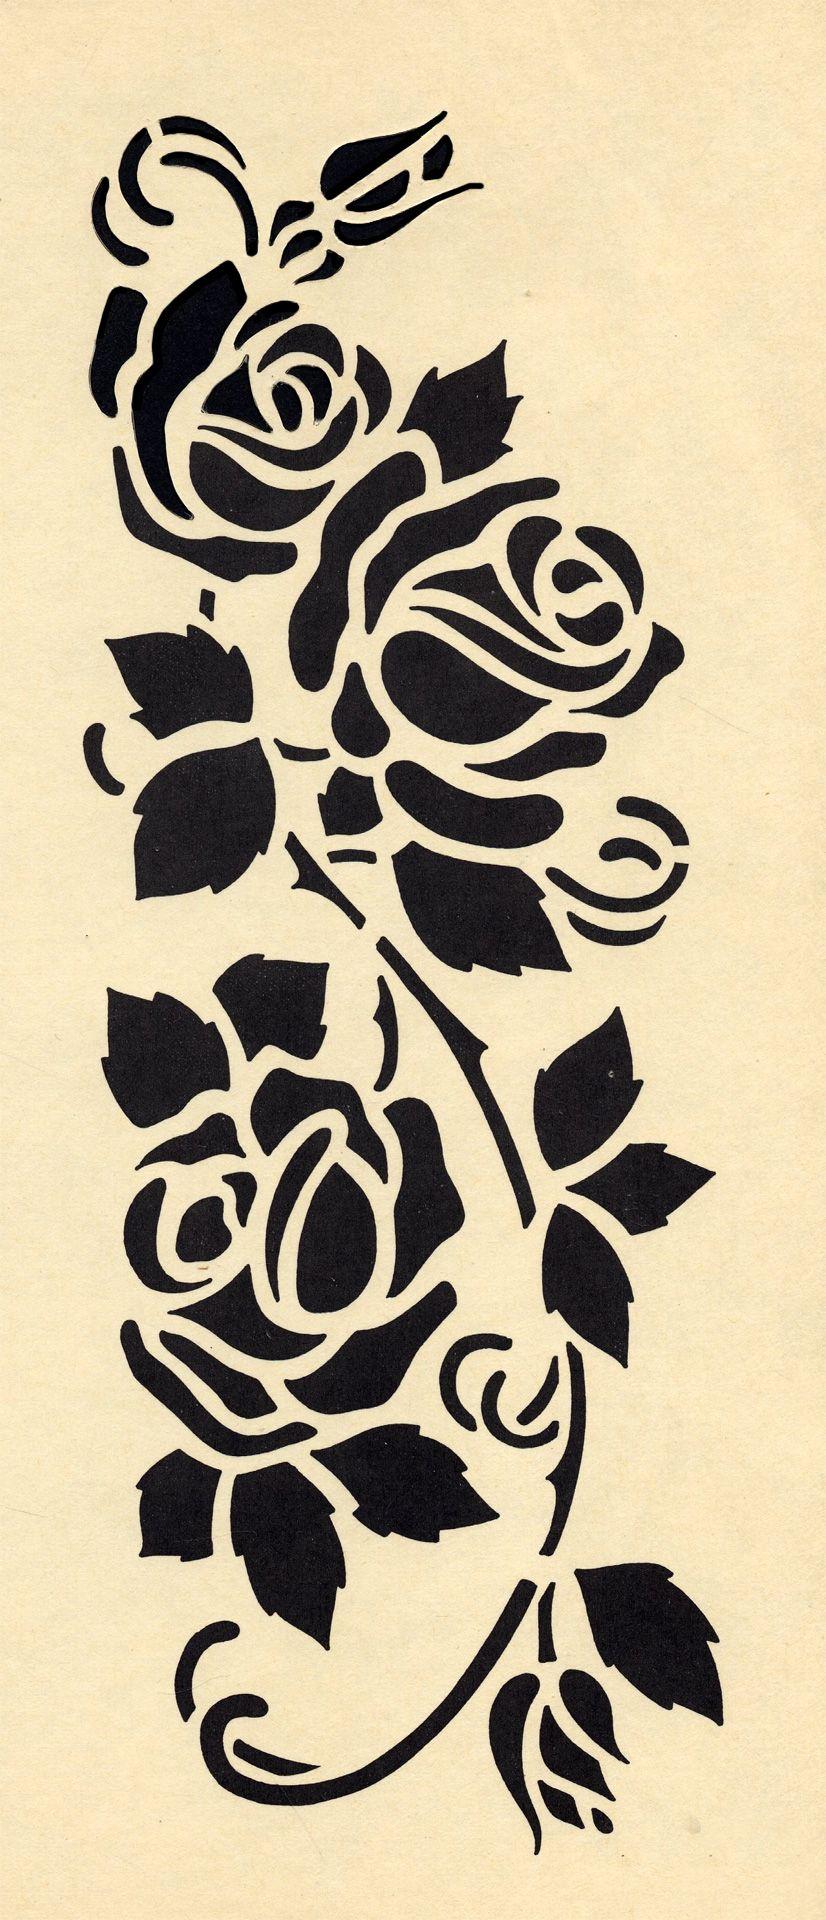 Galerie Des Pochoirs Fleurs Loisirs Creatifs De F1adc